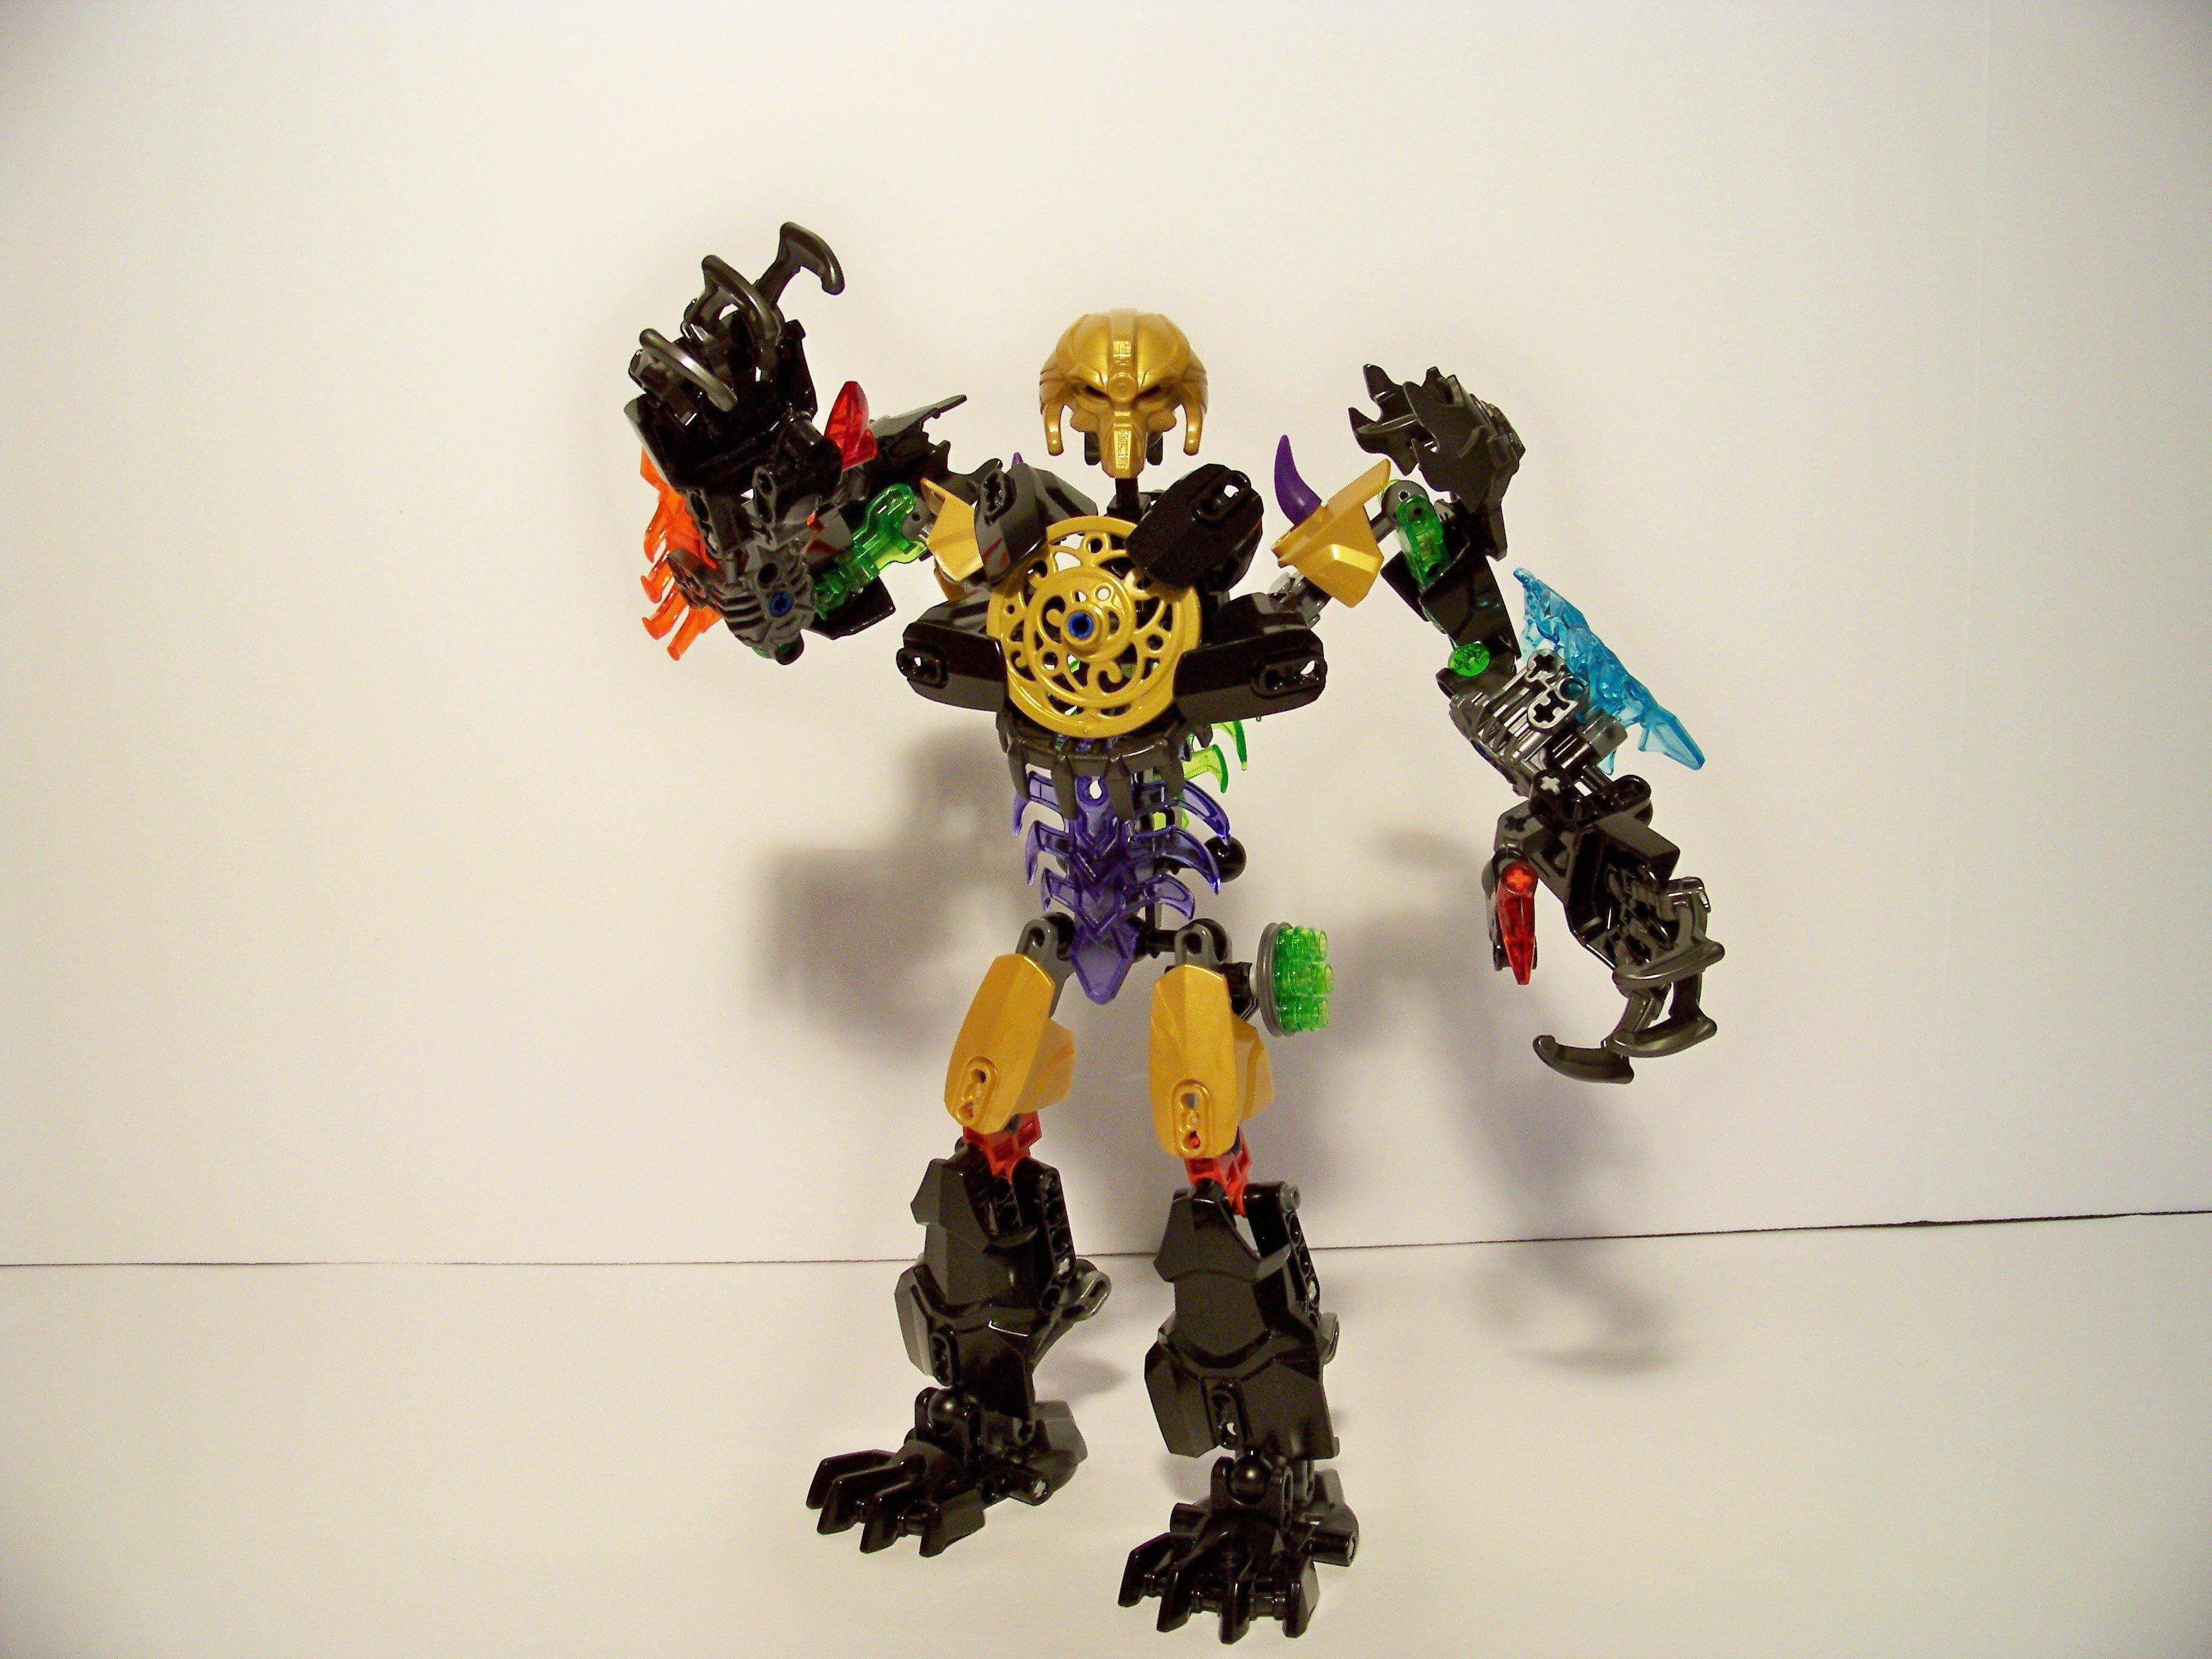 Лего Биониклы (Bionicle) - каталог наборов с инструкциями 22